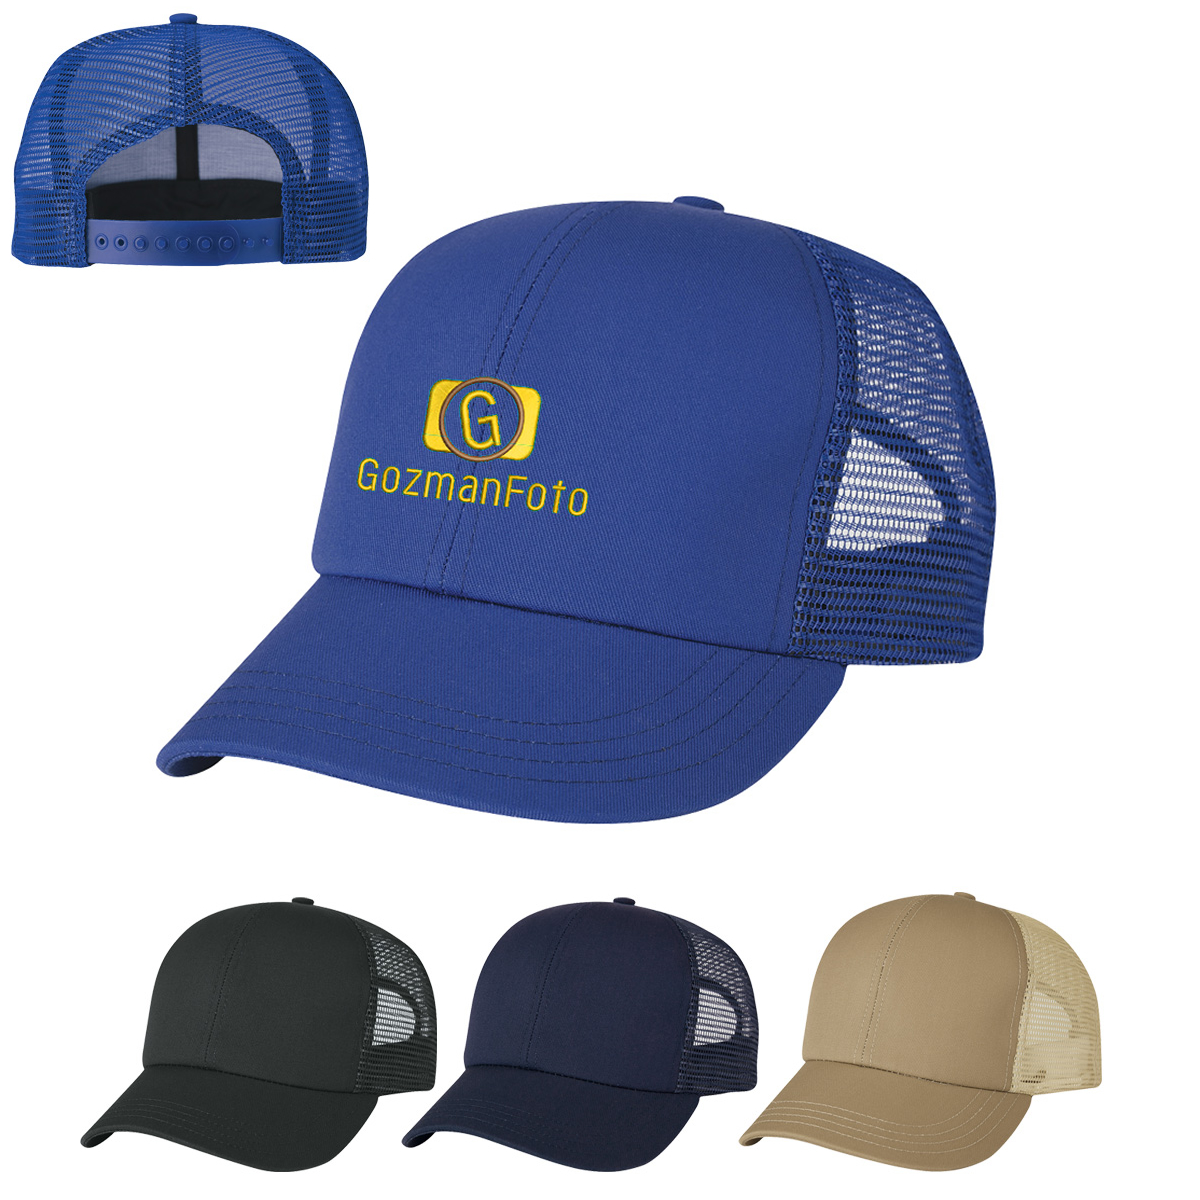 f4446cea744 Customized USA Made Mesh Back Cap